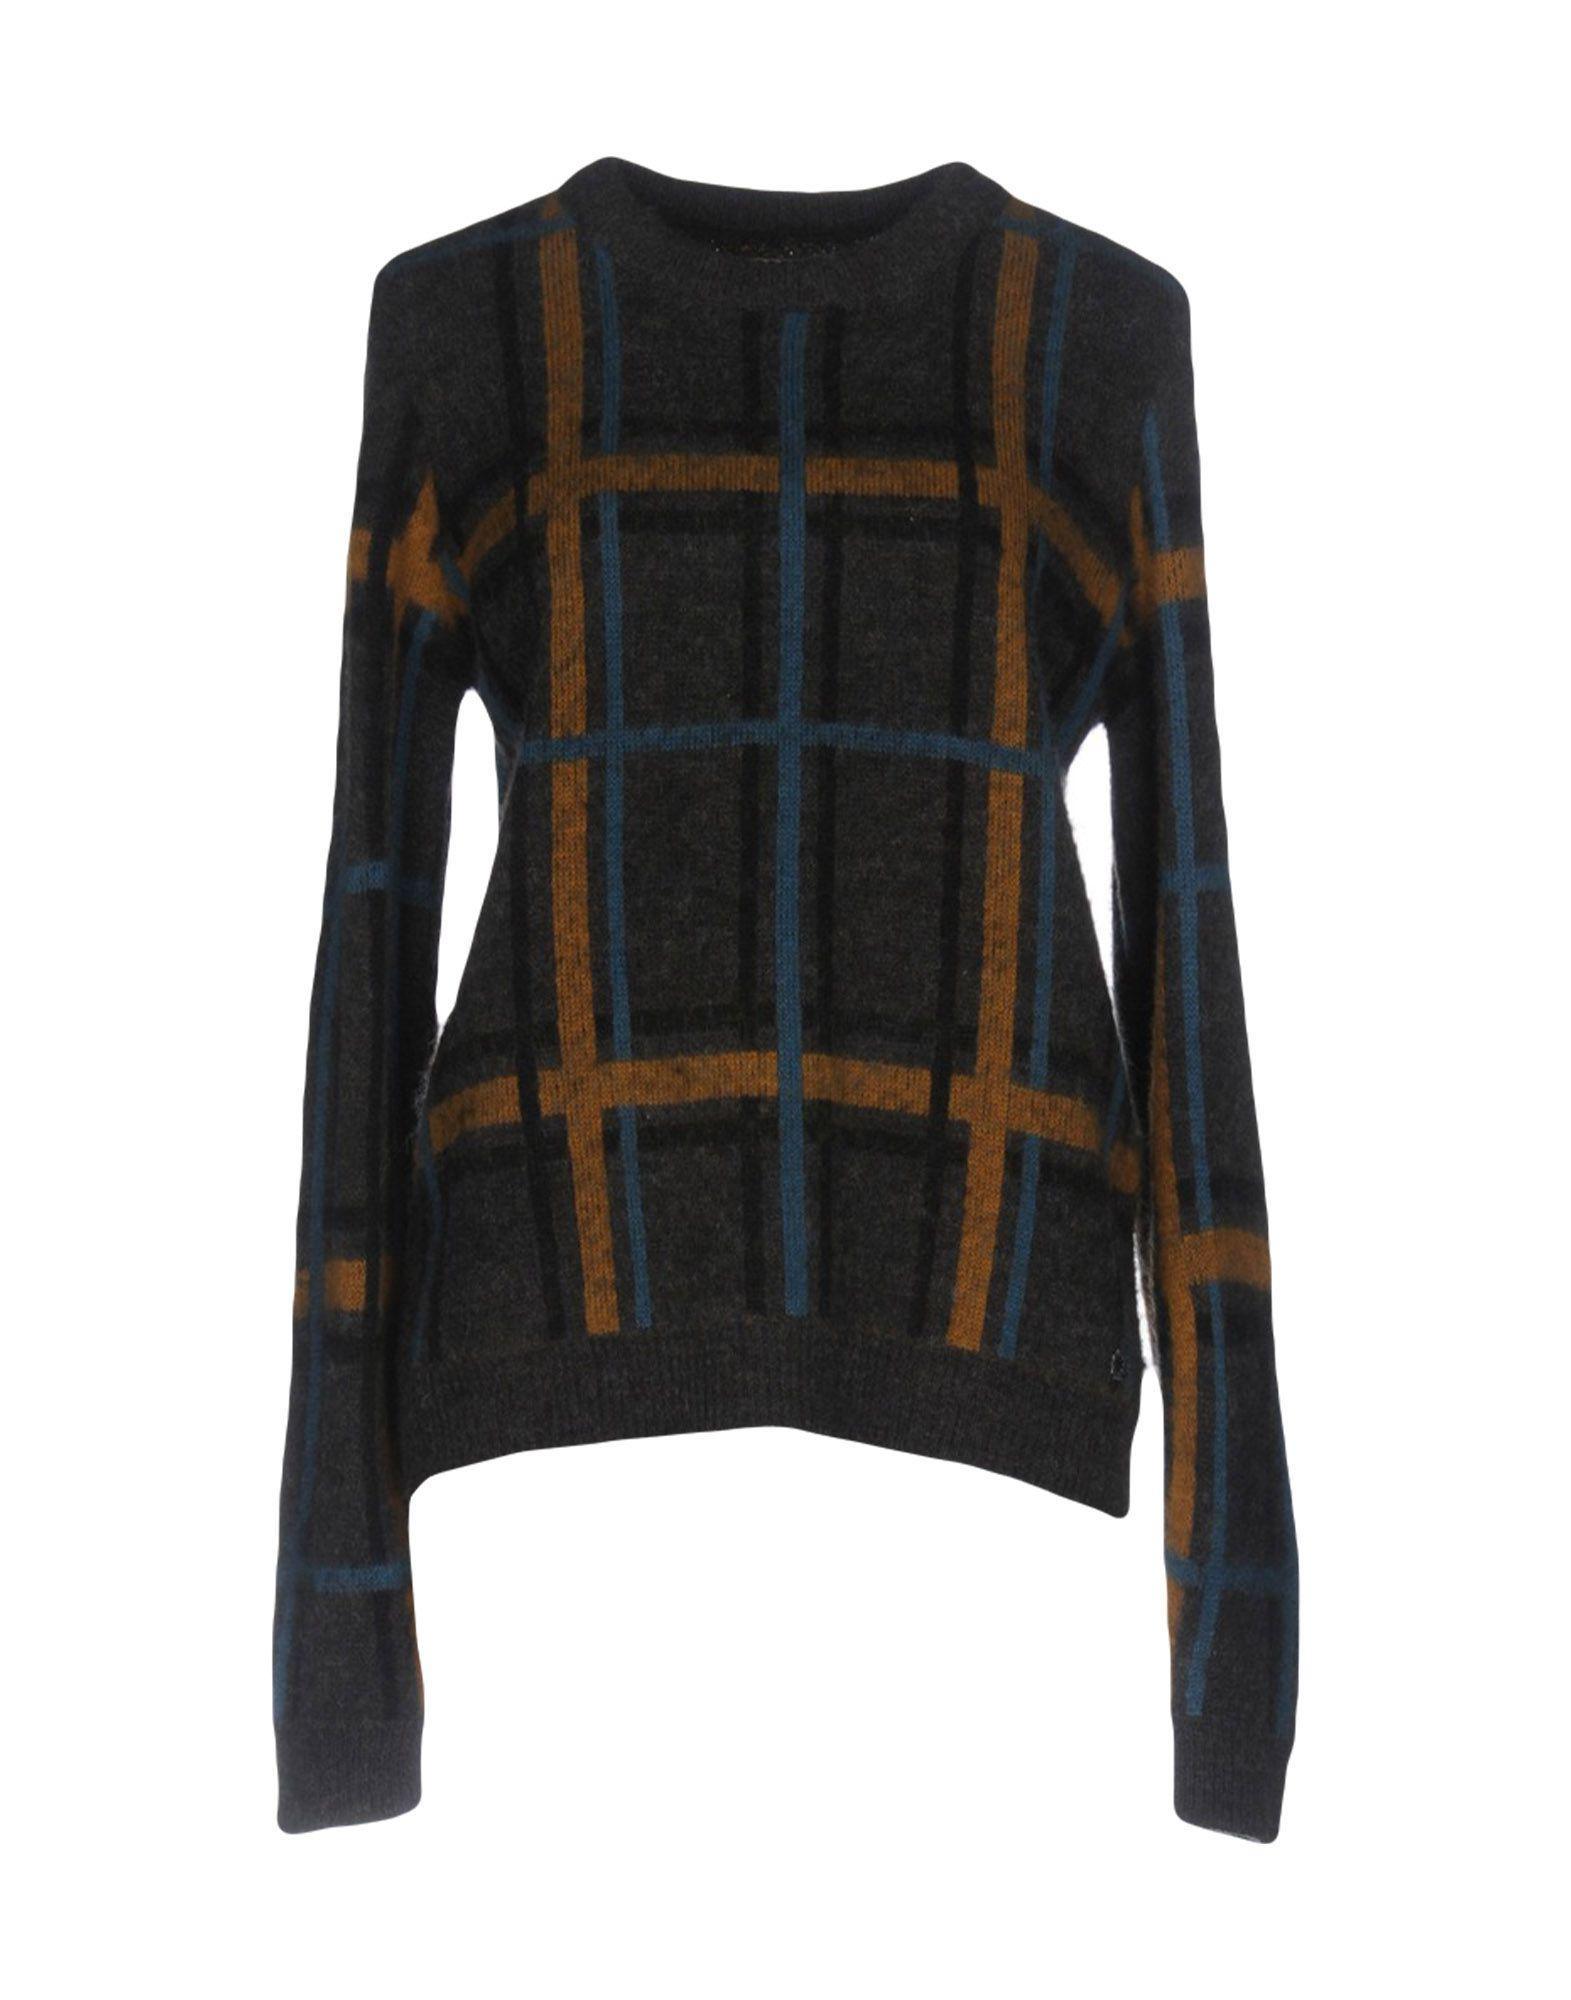 NÜMPH Damen Pullover Farbe Blei Größe 5 jetztbilligerkaufen